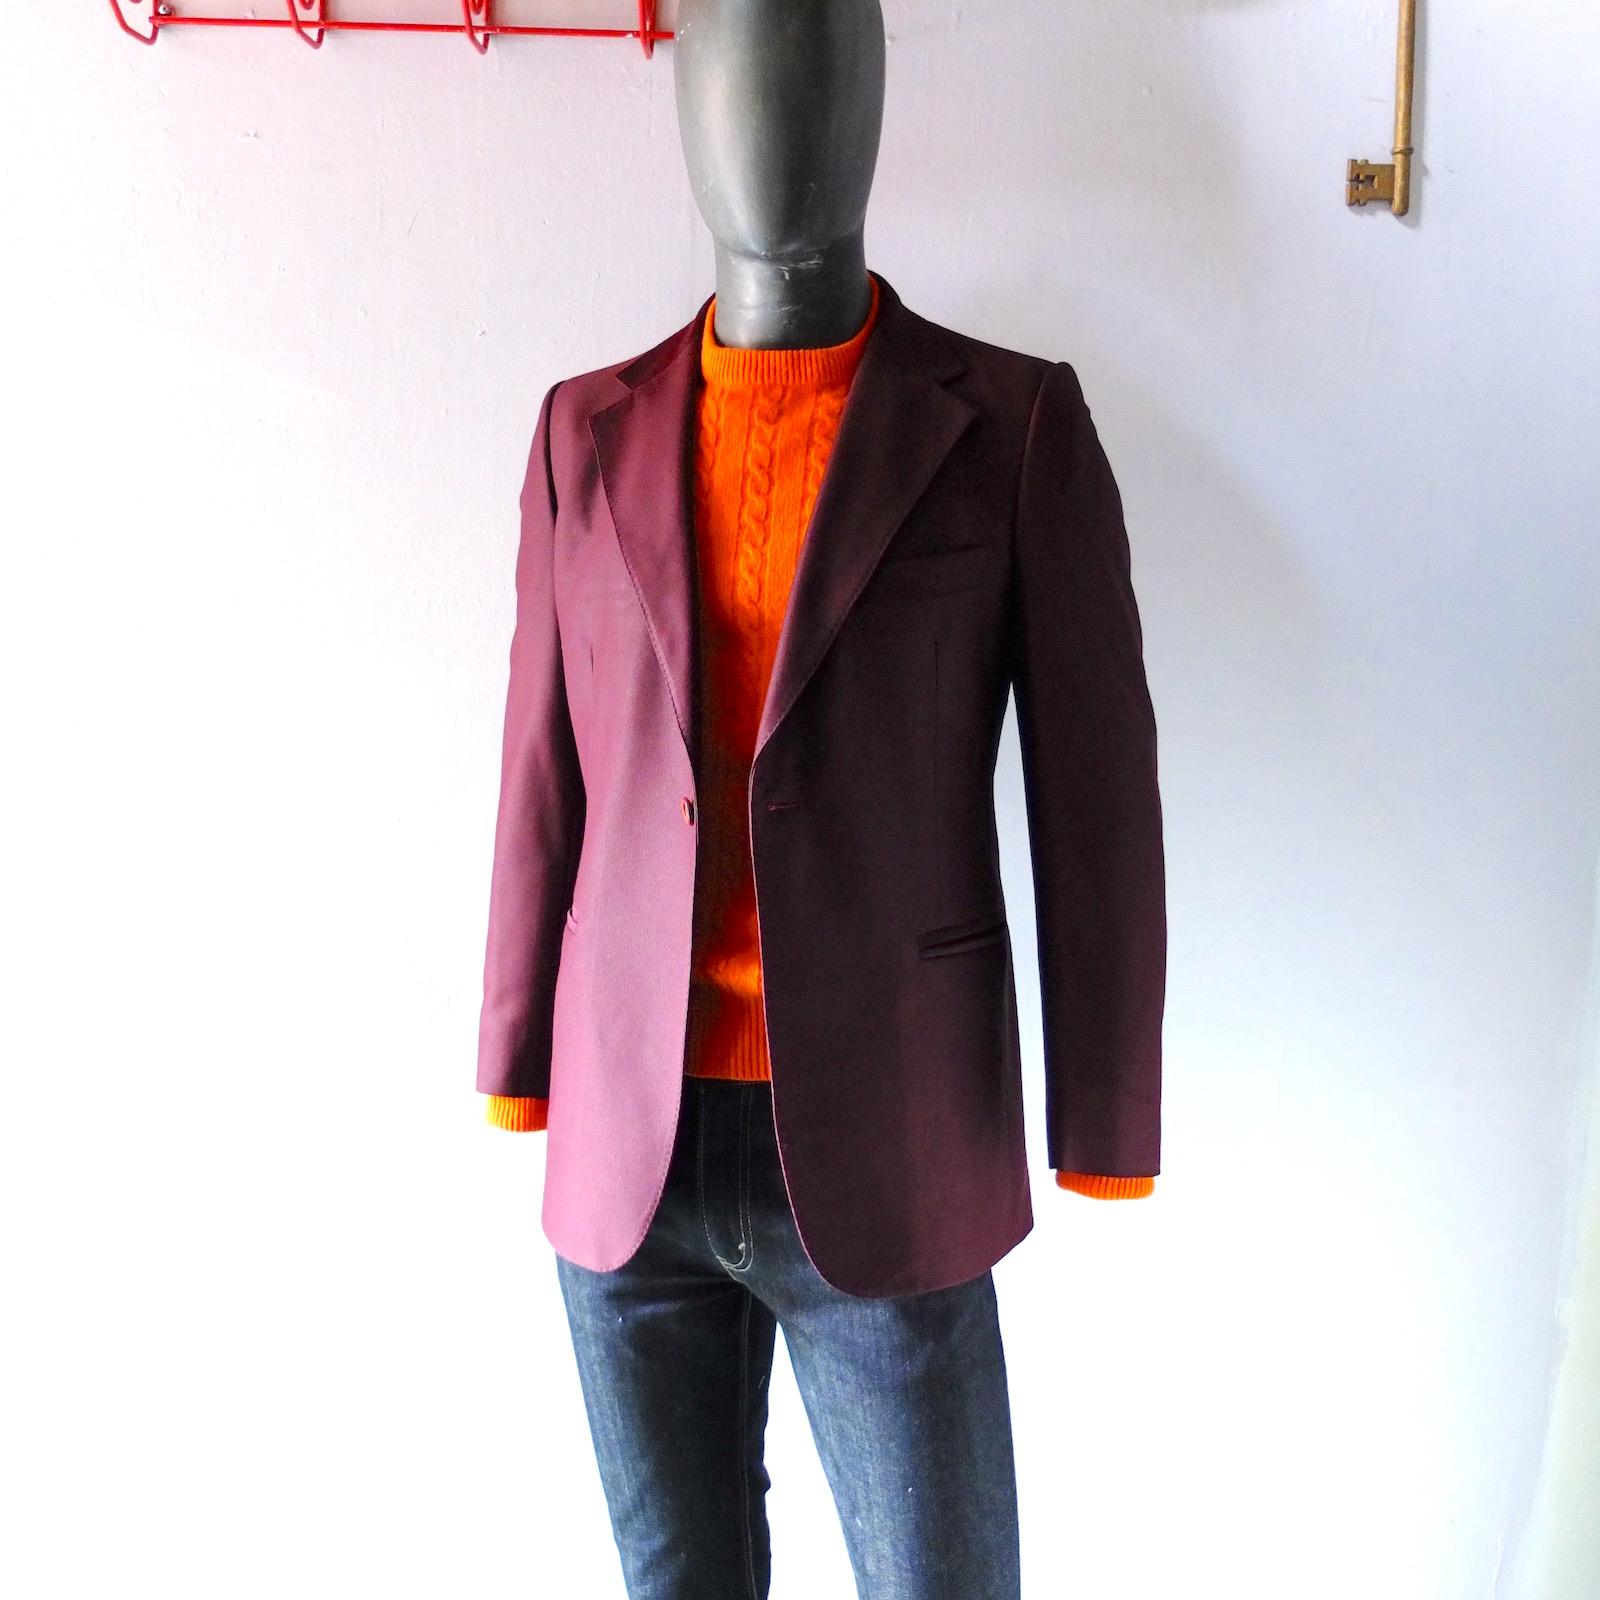 e80dd6b2db Vintage Tailored Ole Hansen Copenhagen Plum Sport Coat 38 / 40 R ...